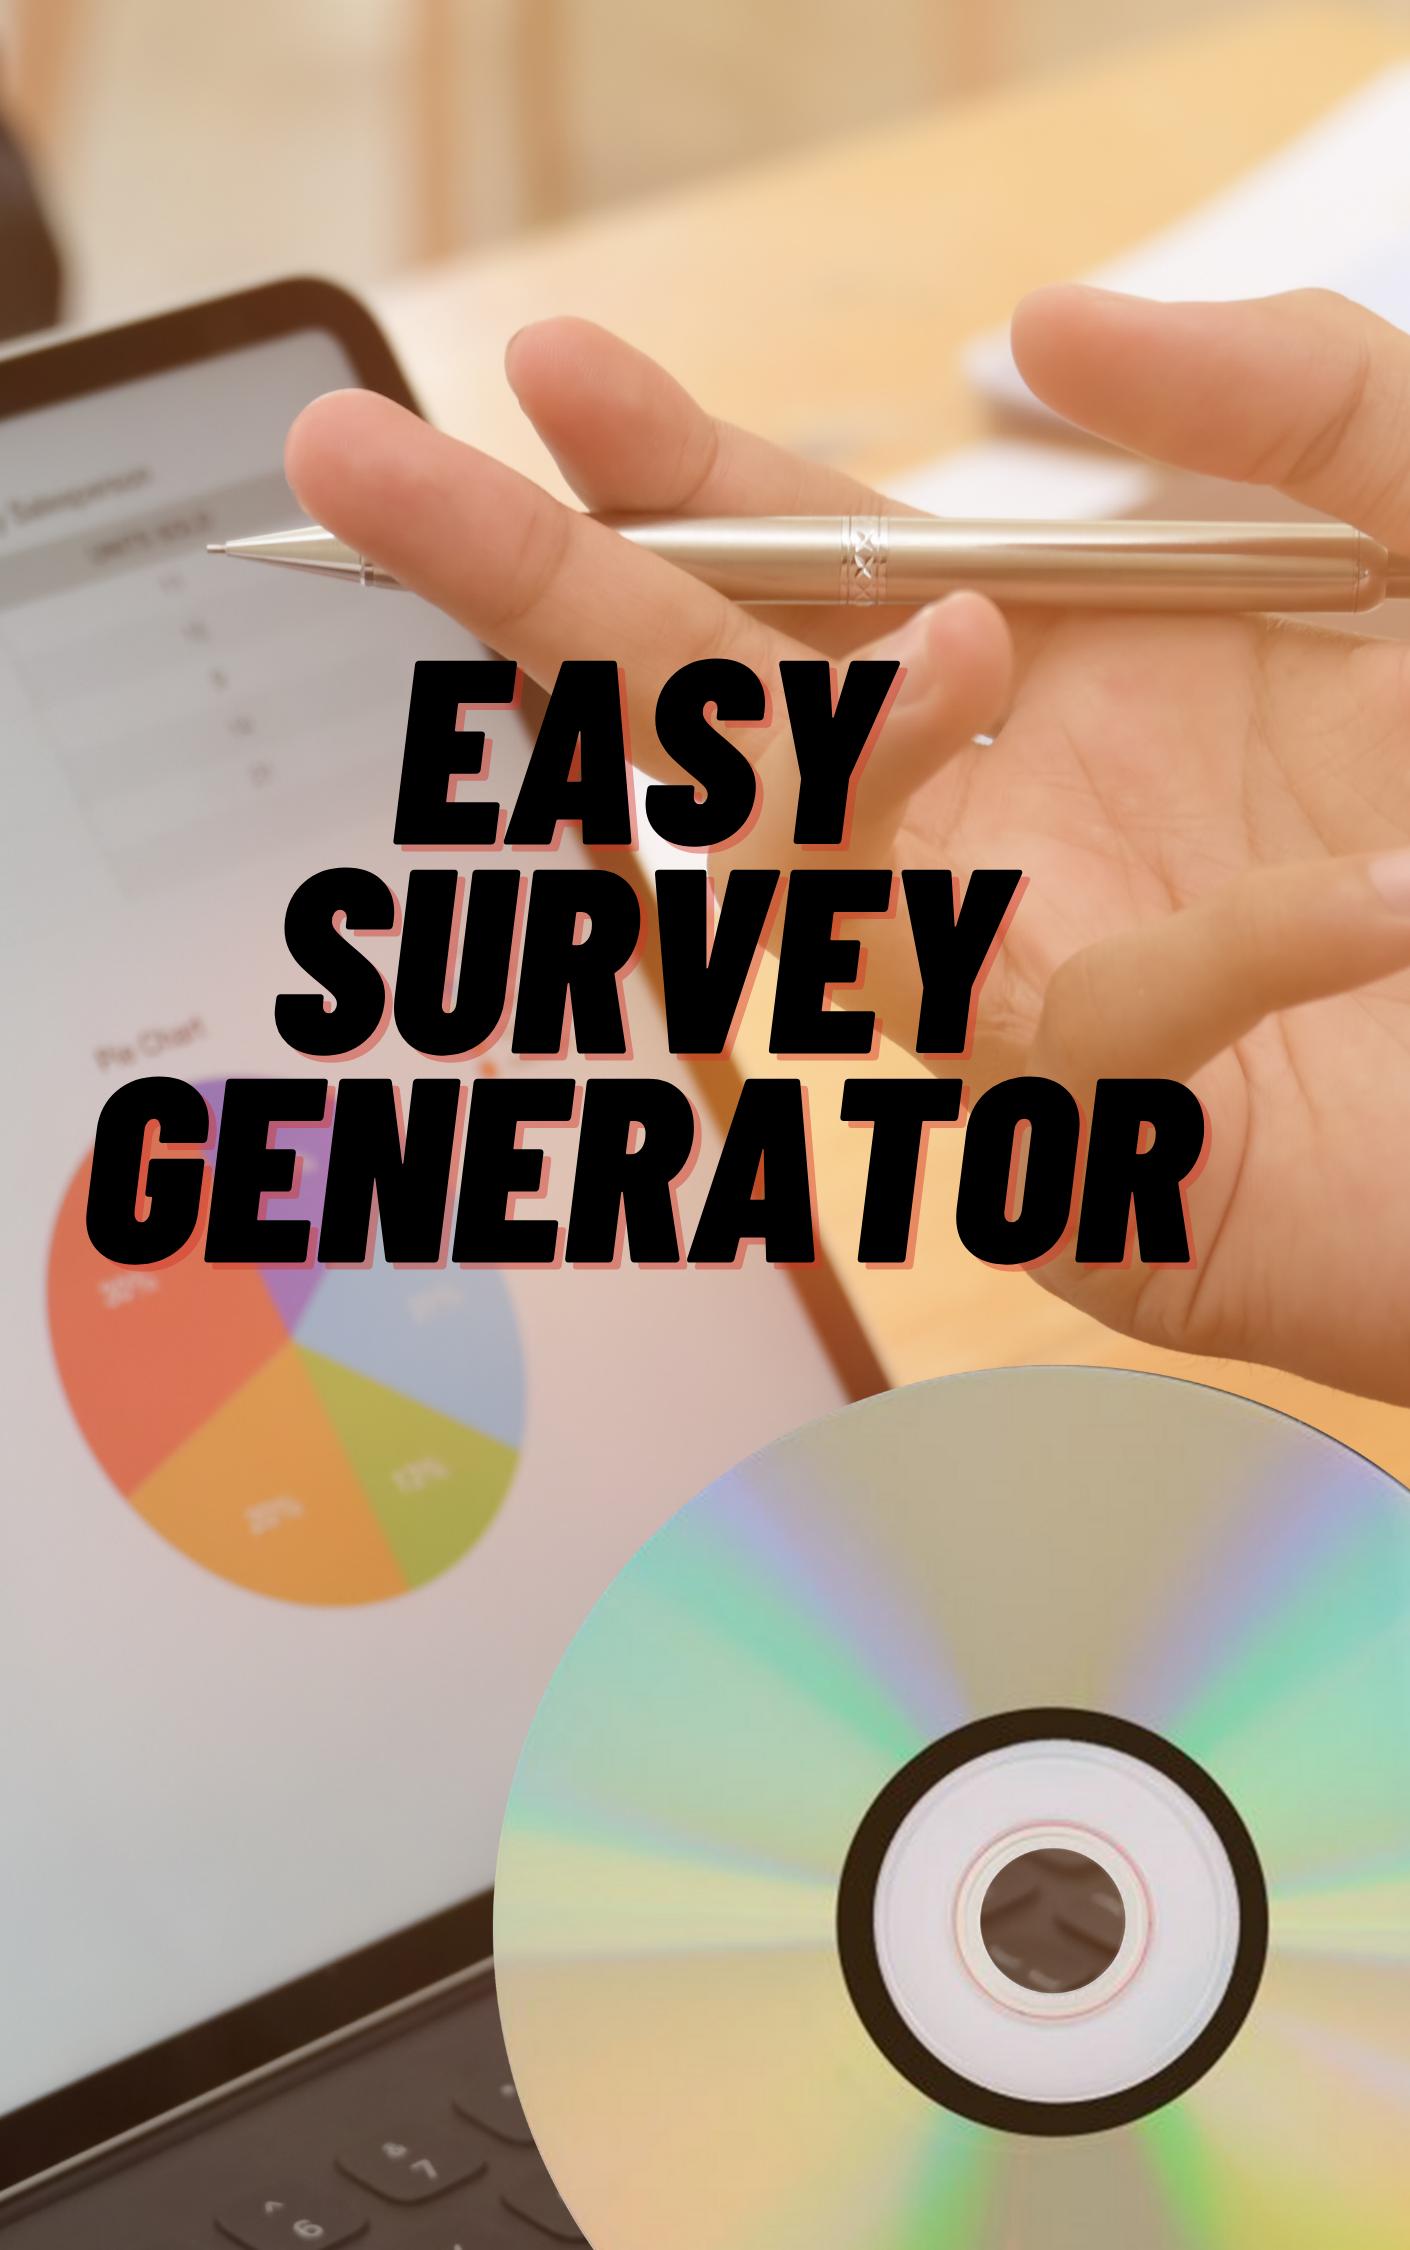 Generator for easy surveys for anyone